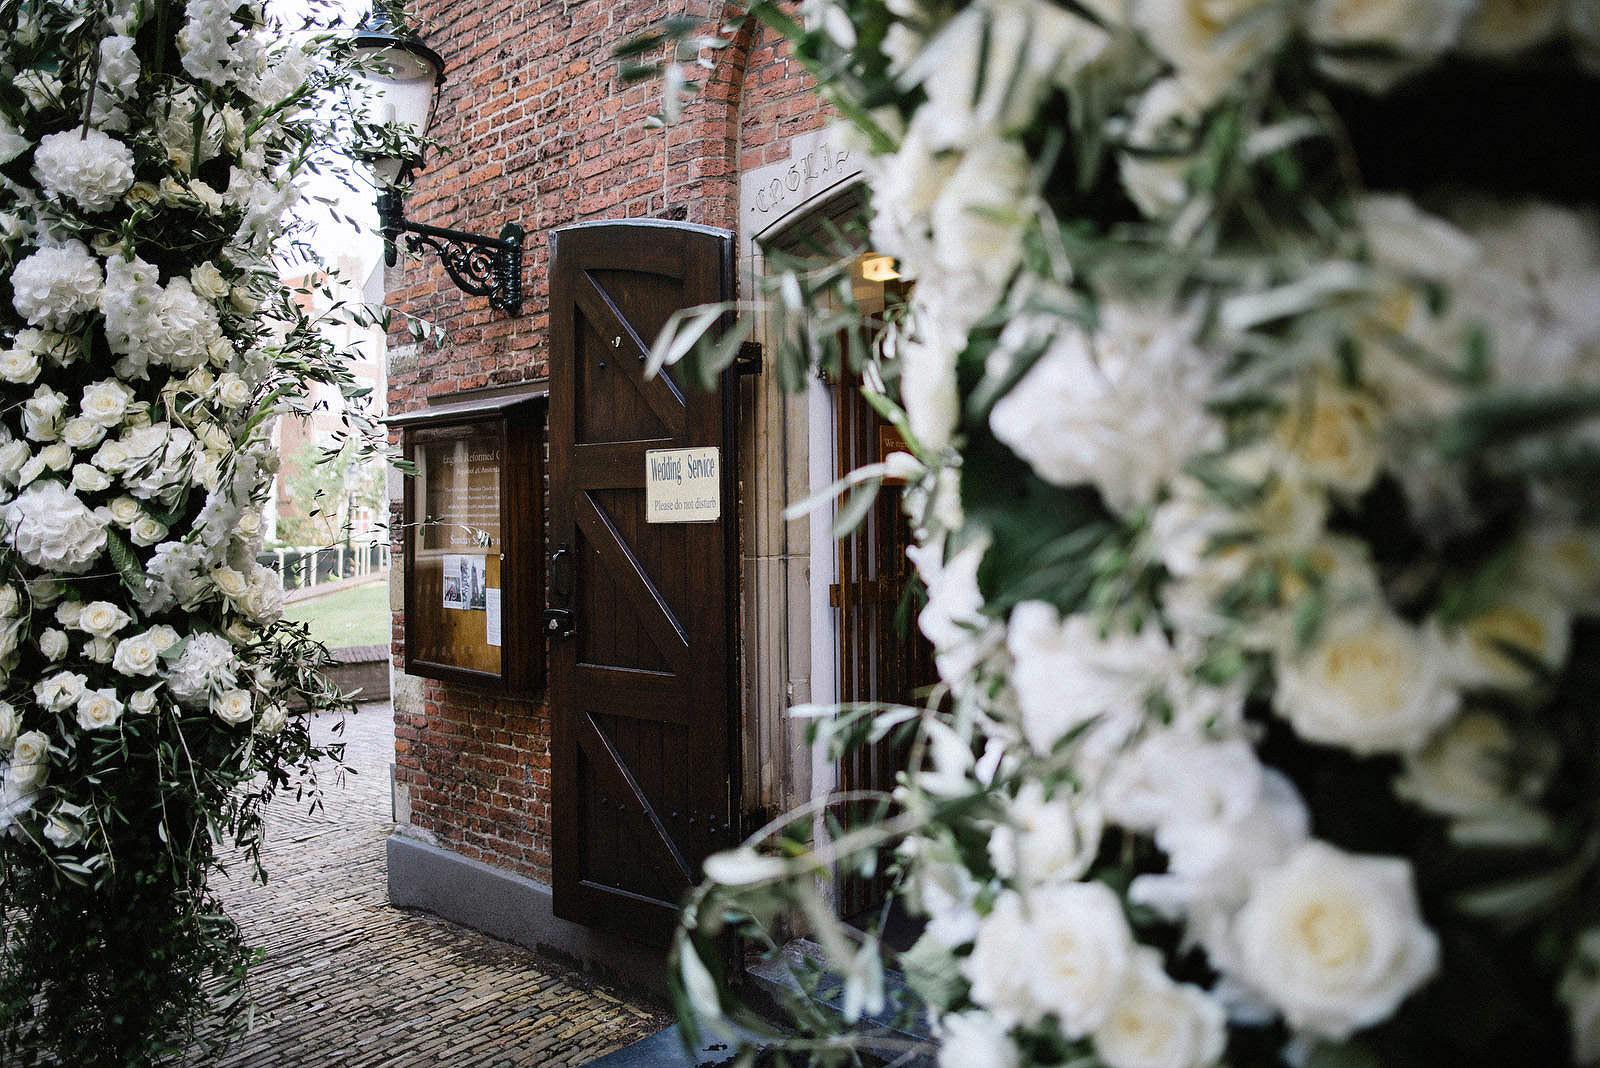 Fotograf Konstanz - Destination Wedding Photographer Amsterdam 027 - Destination Wedding Amsterdam  - 140 -